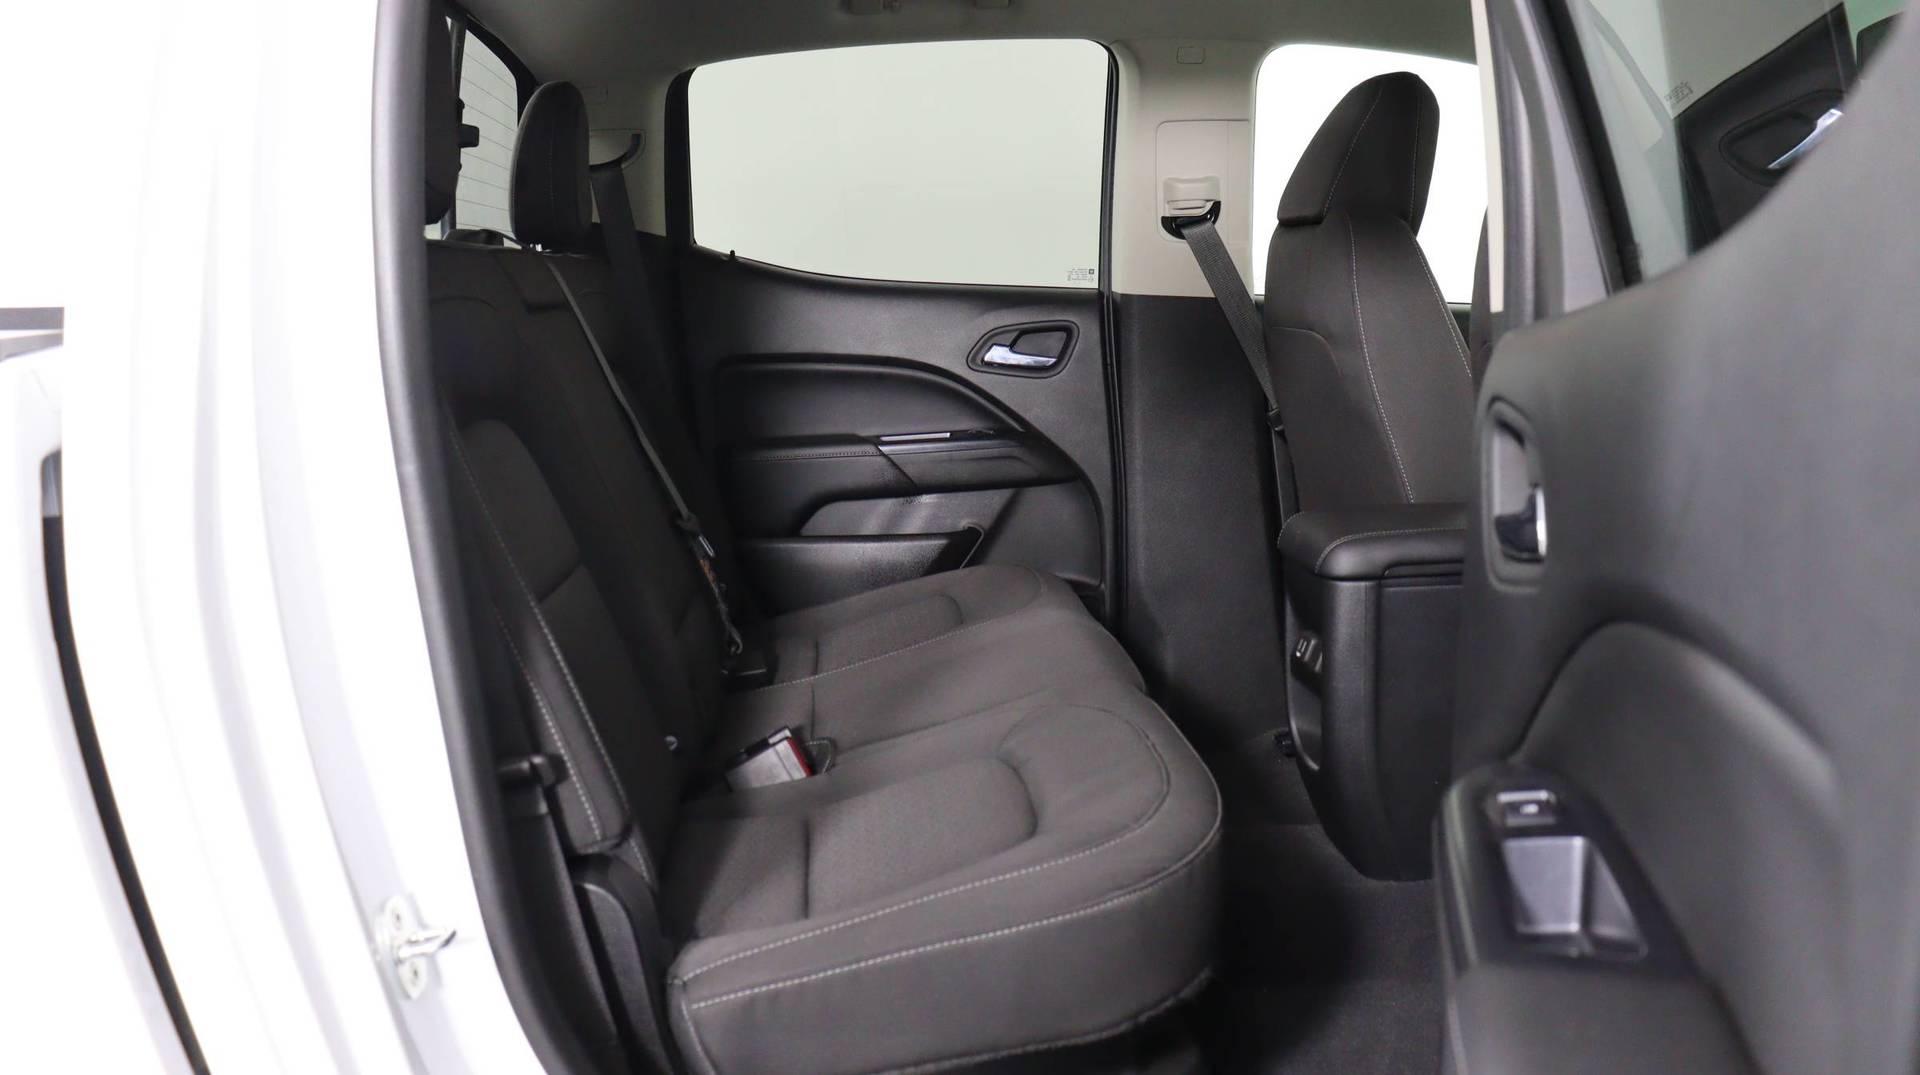 Carvix - Used vehicle - Truck GMC CANYON 2021